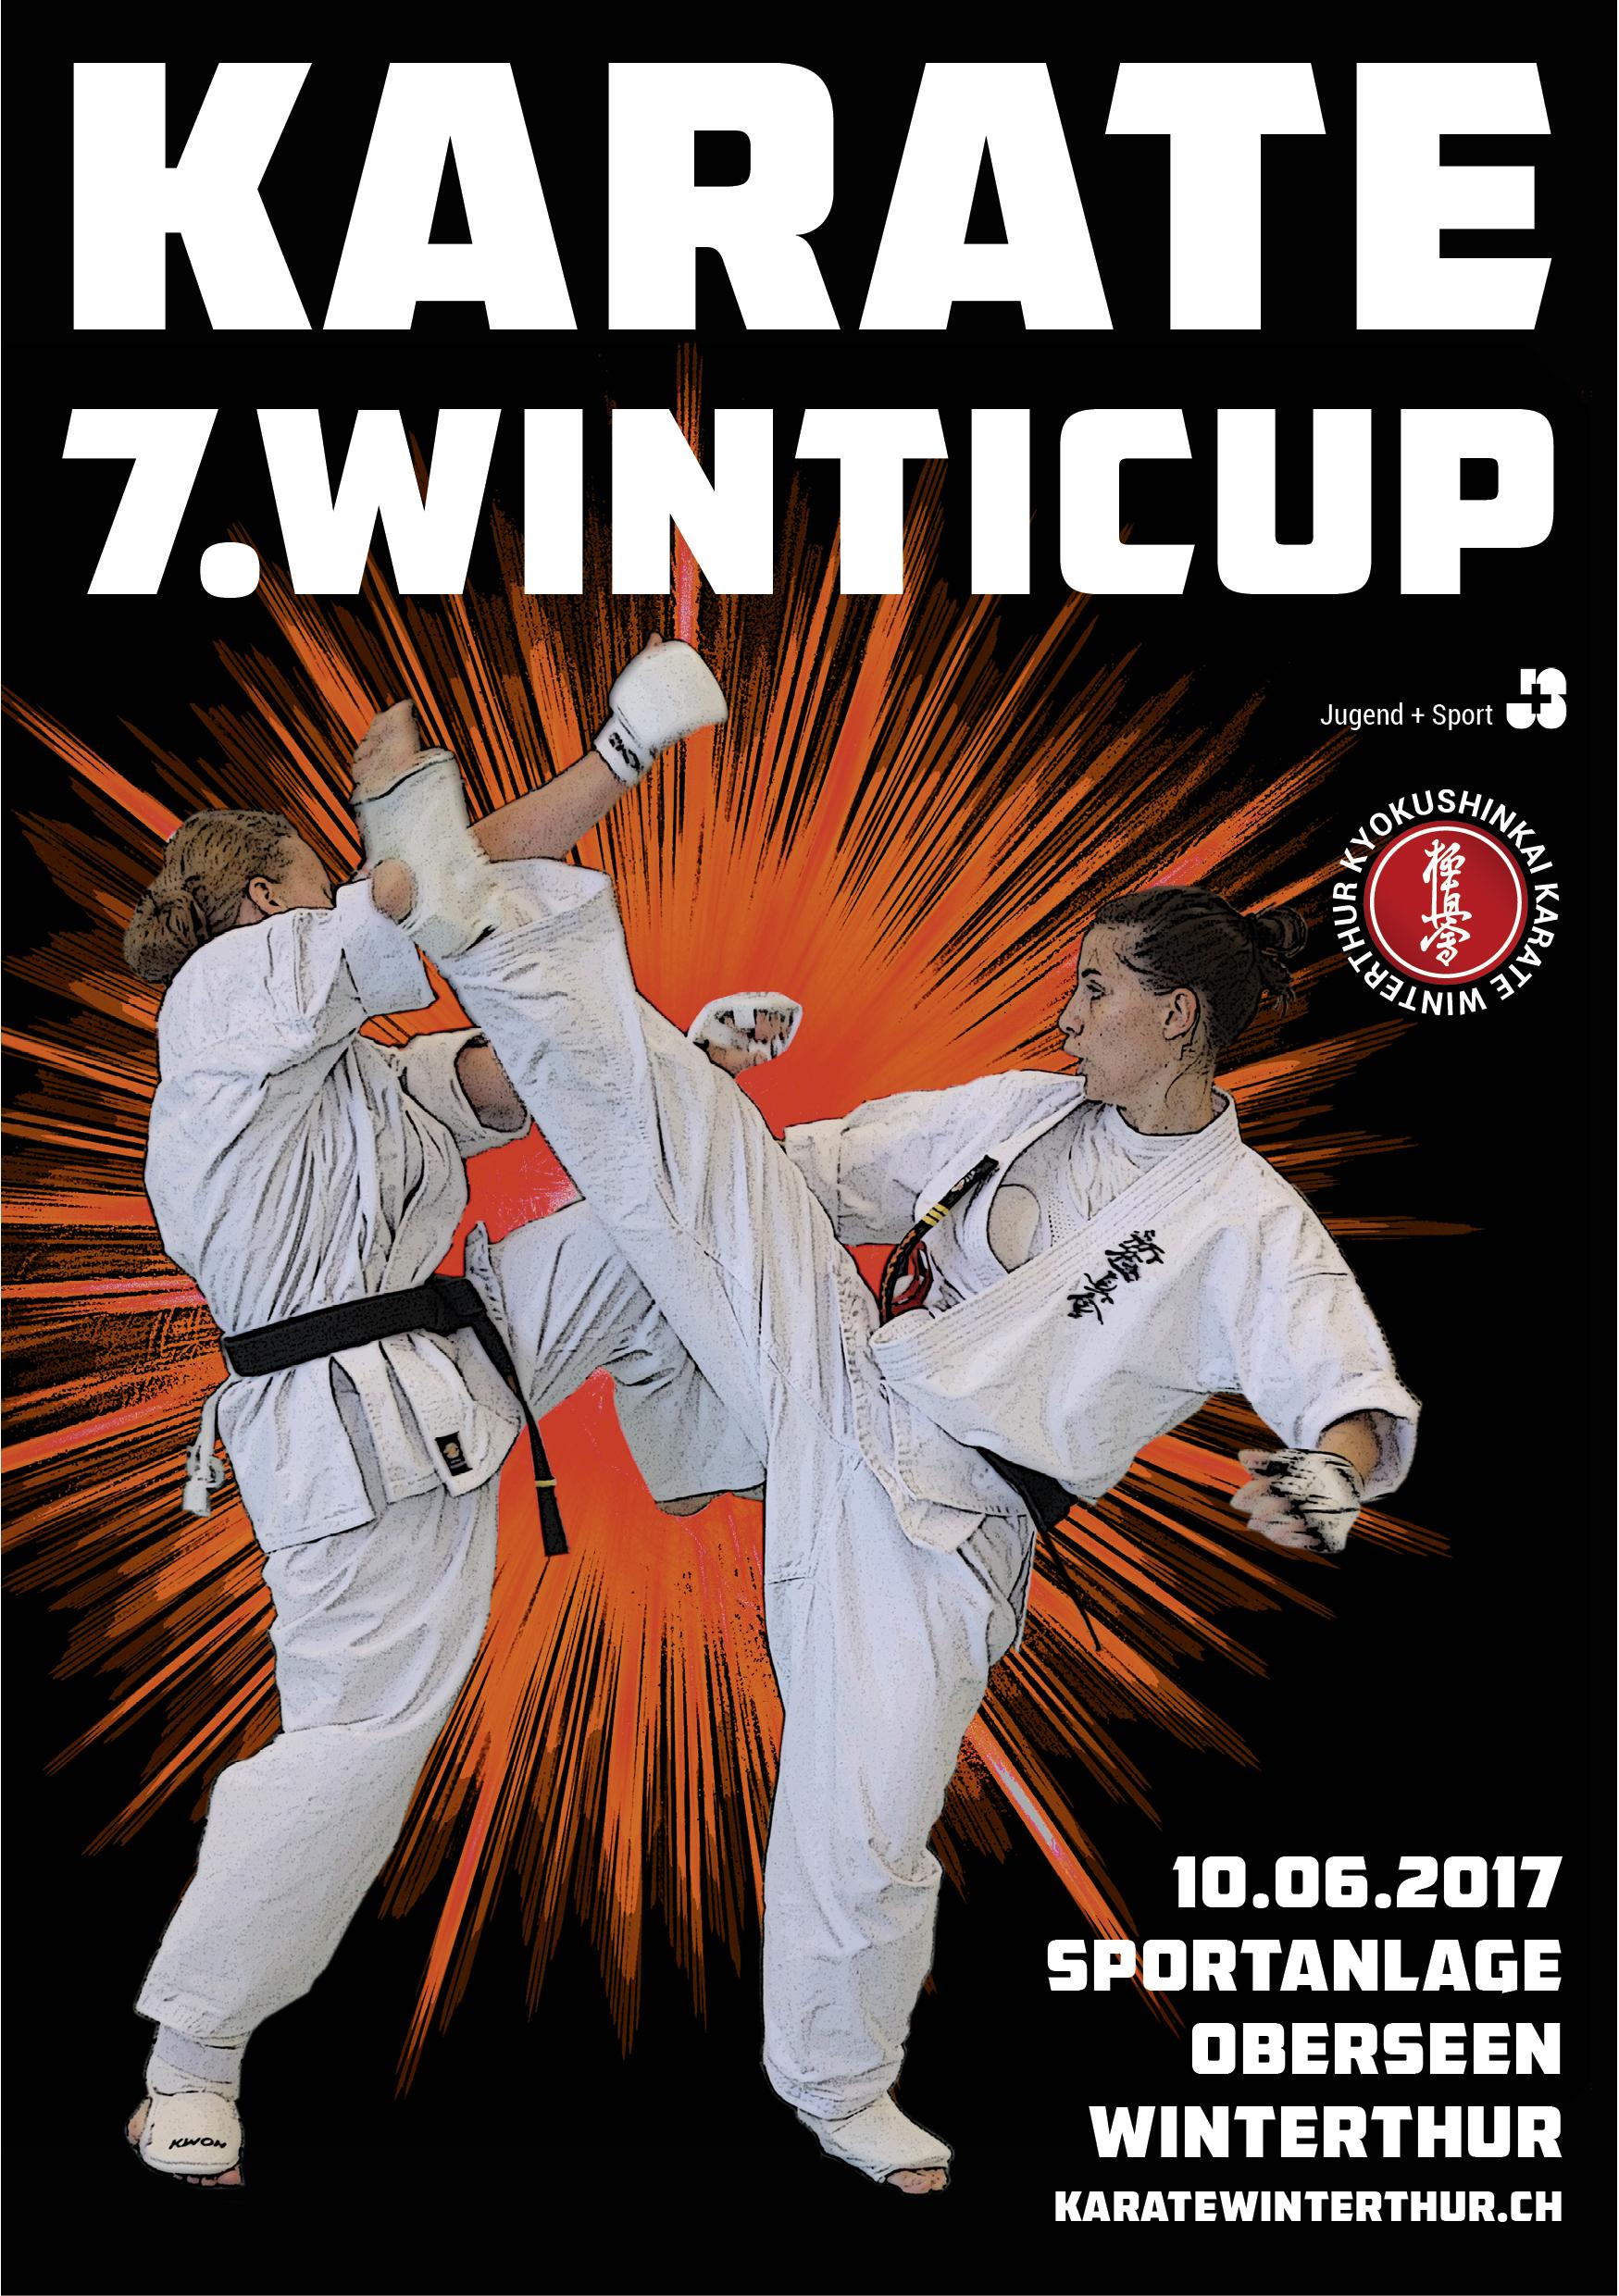 flyera5_7.winticup2017